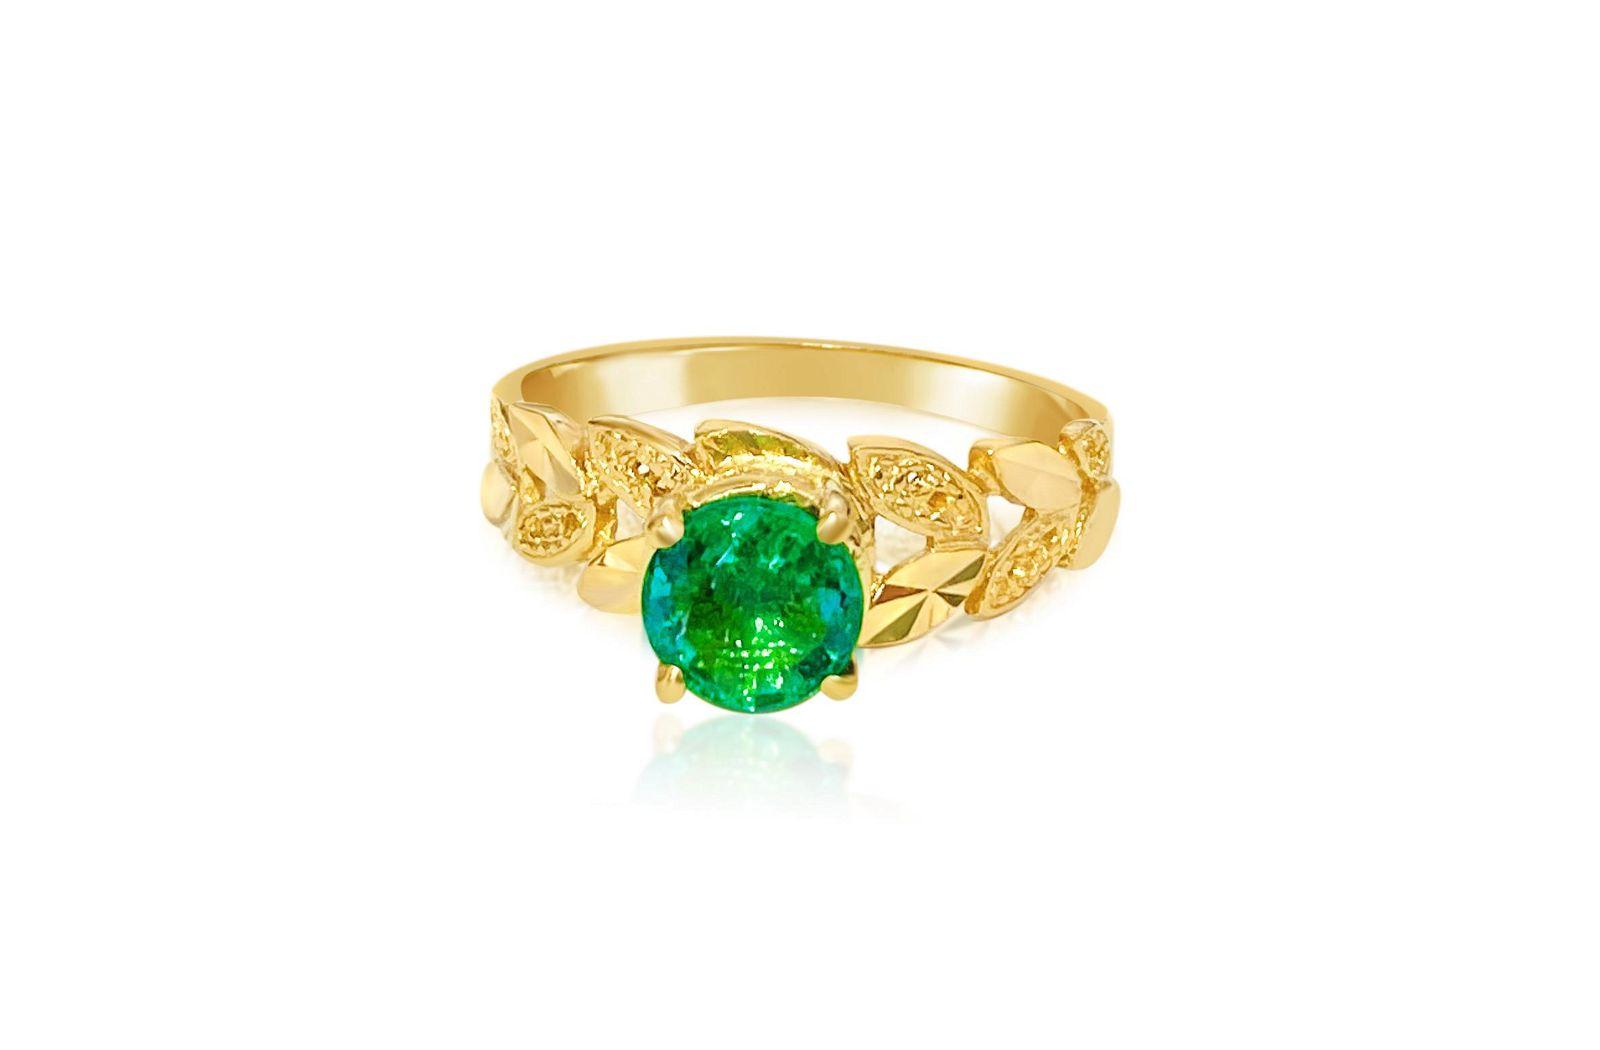 Vintage 22k-18K Yellow Gold & Emerald Ring (Certified)